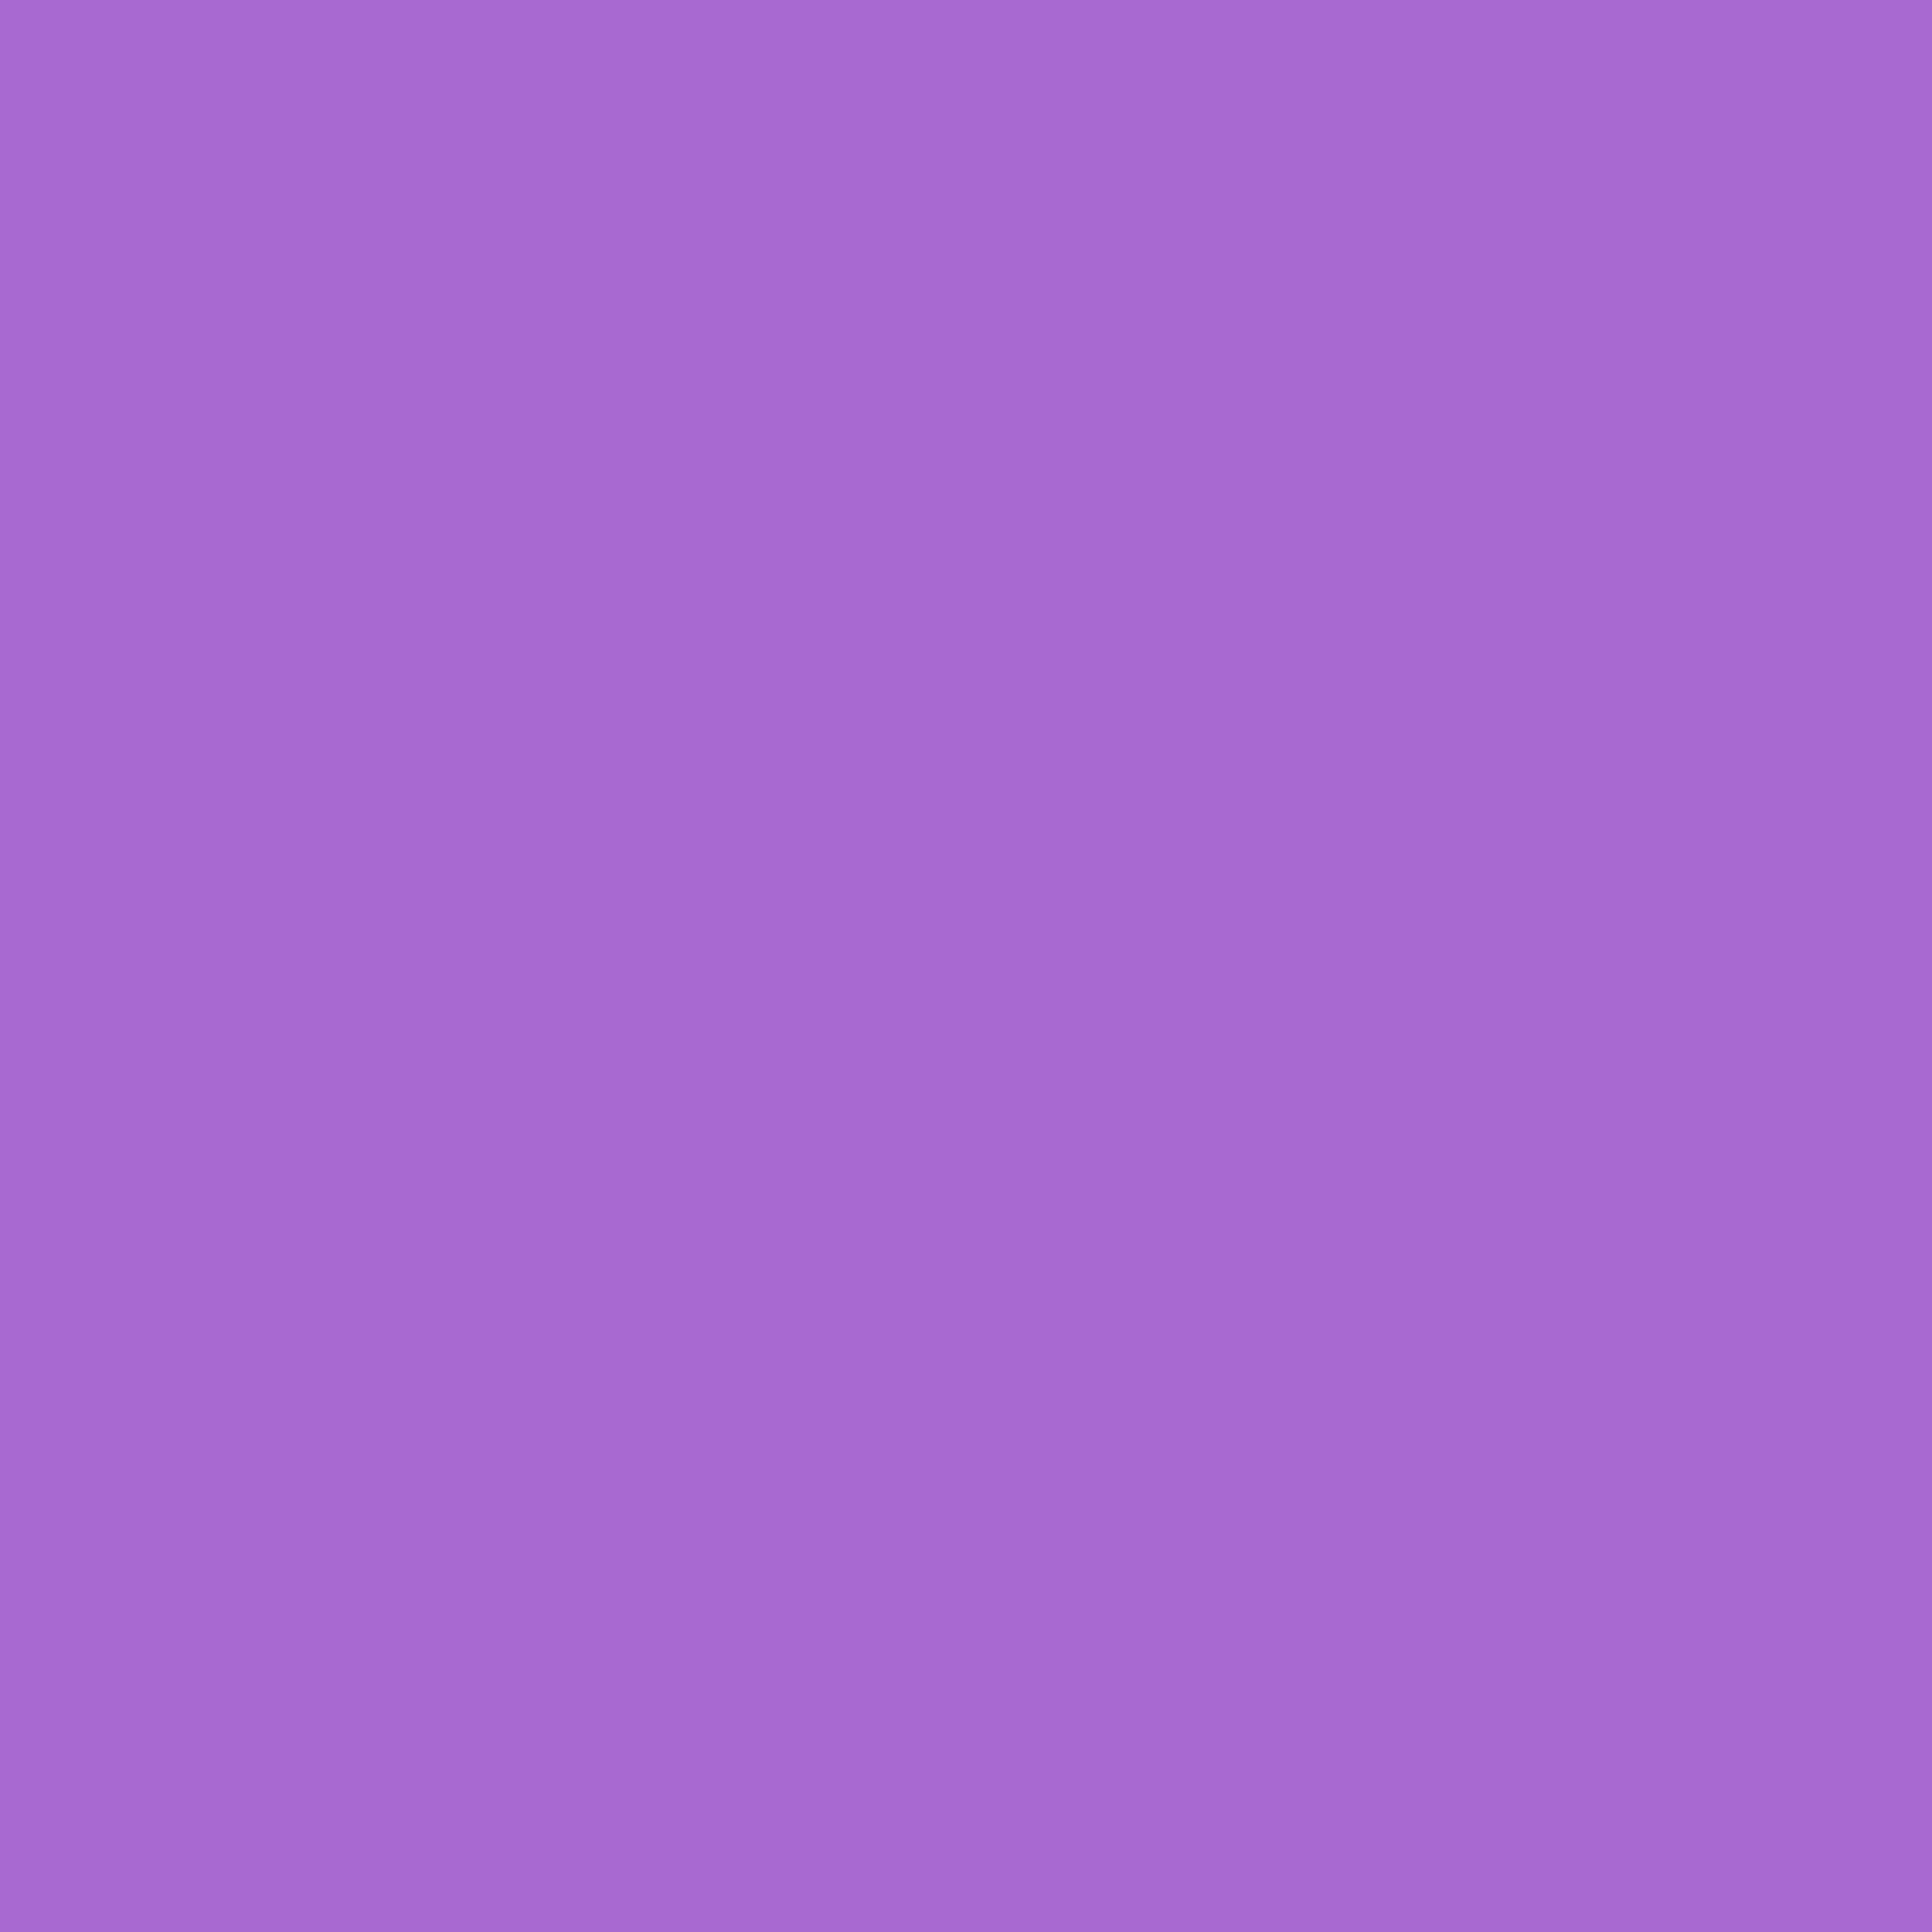 2732x2732 Rich Lavender Solid Color Background